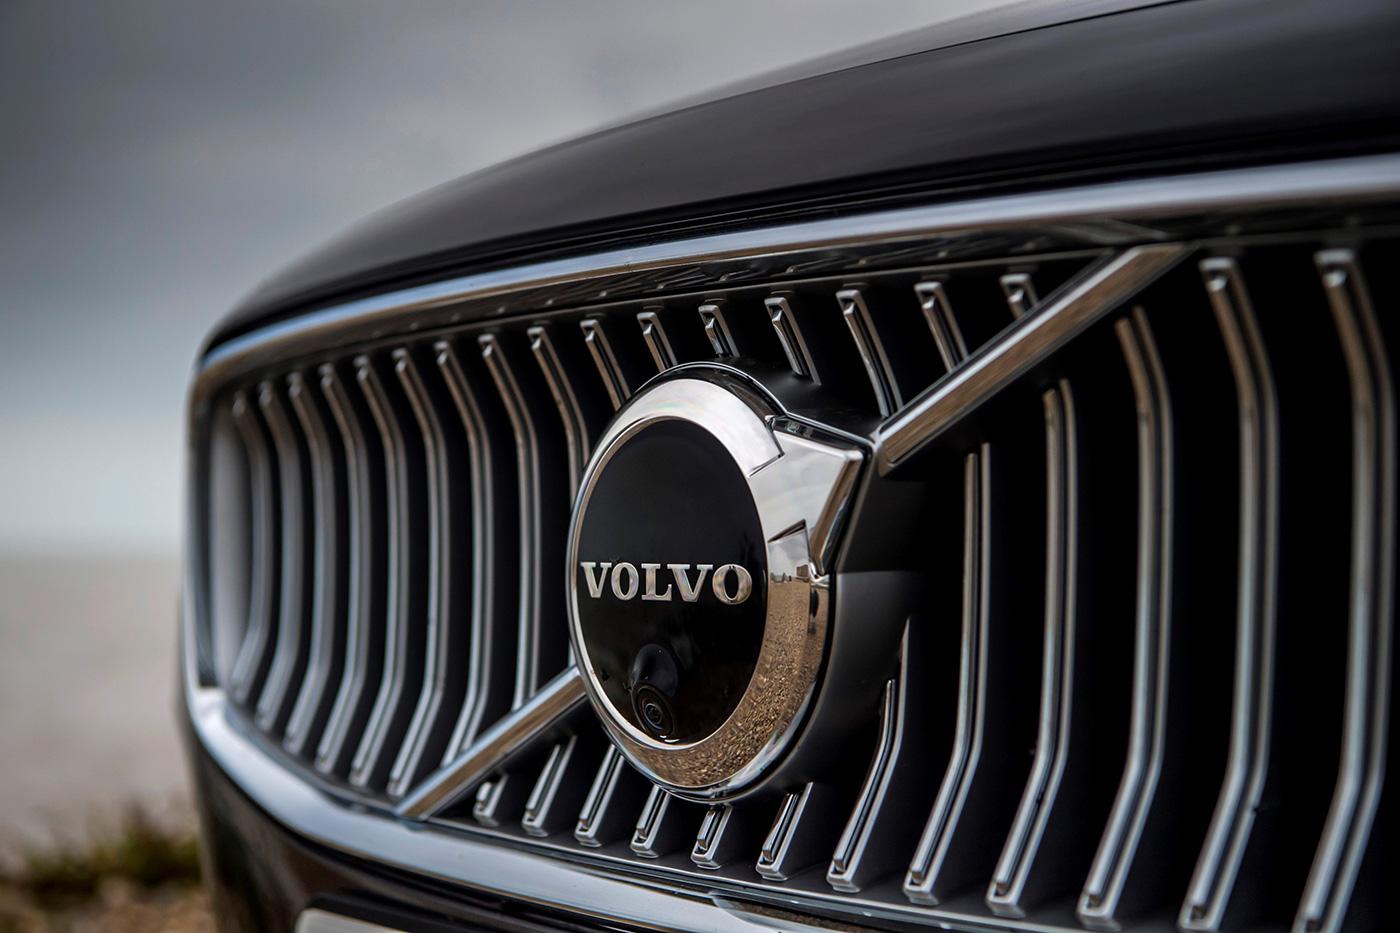 Volvo logo on grill